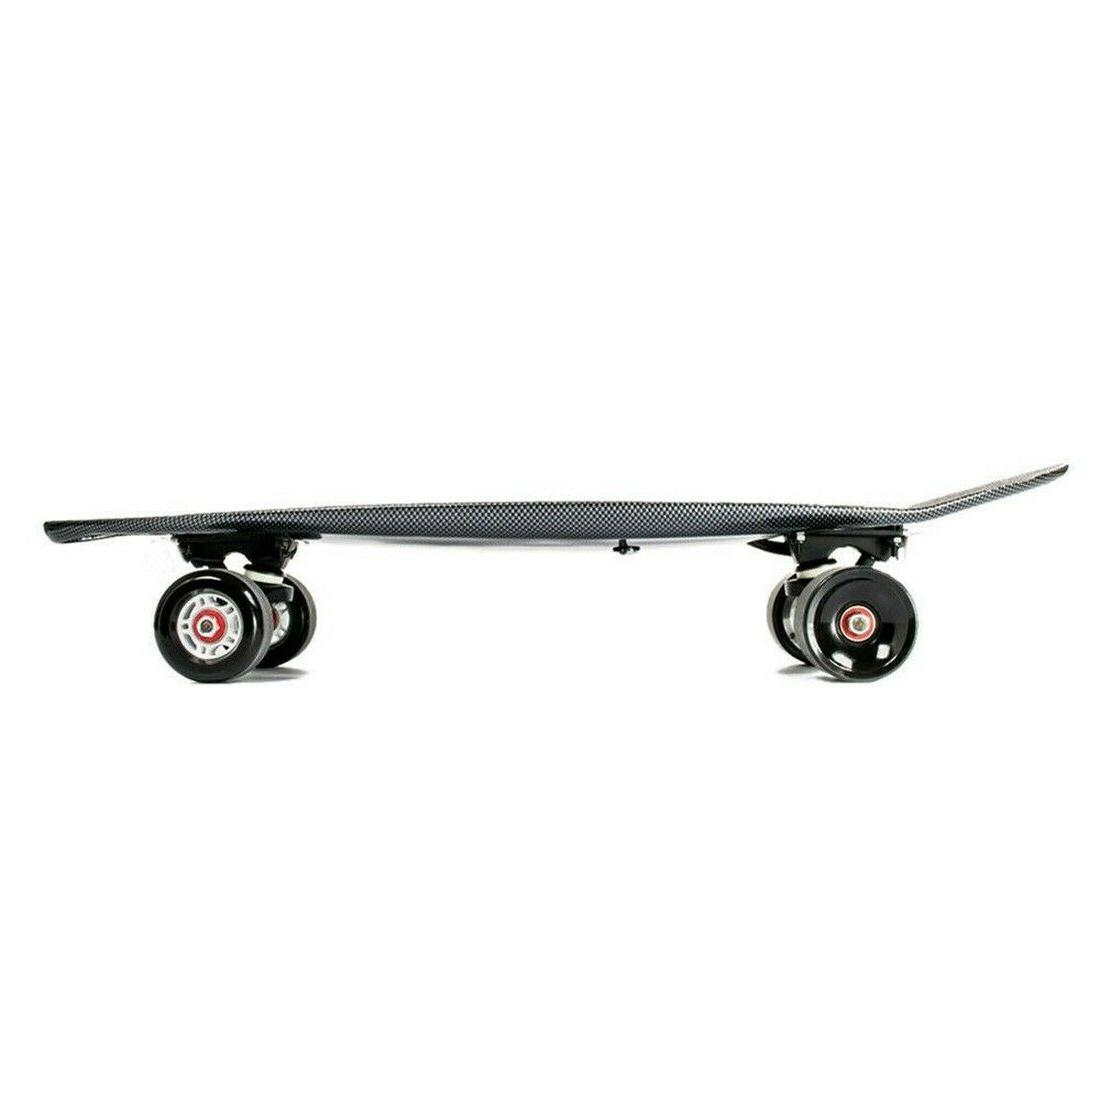 NEW Maxfind 27 Electric Skateboard Remote Controller Max-C